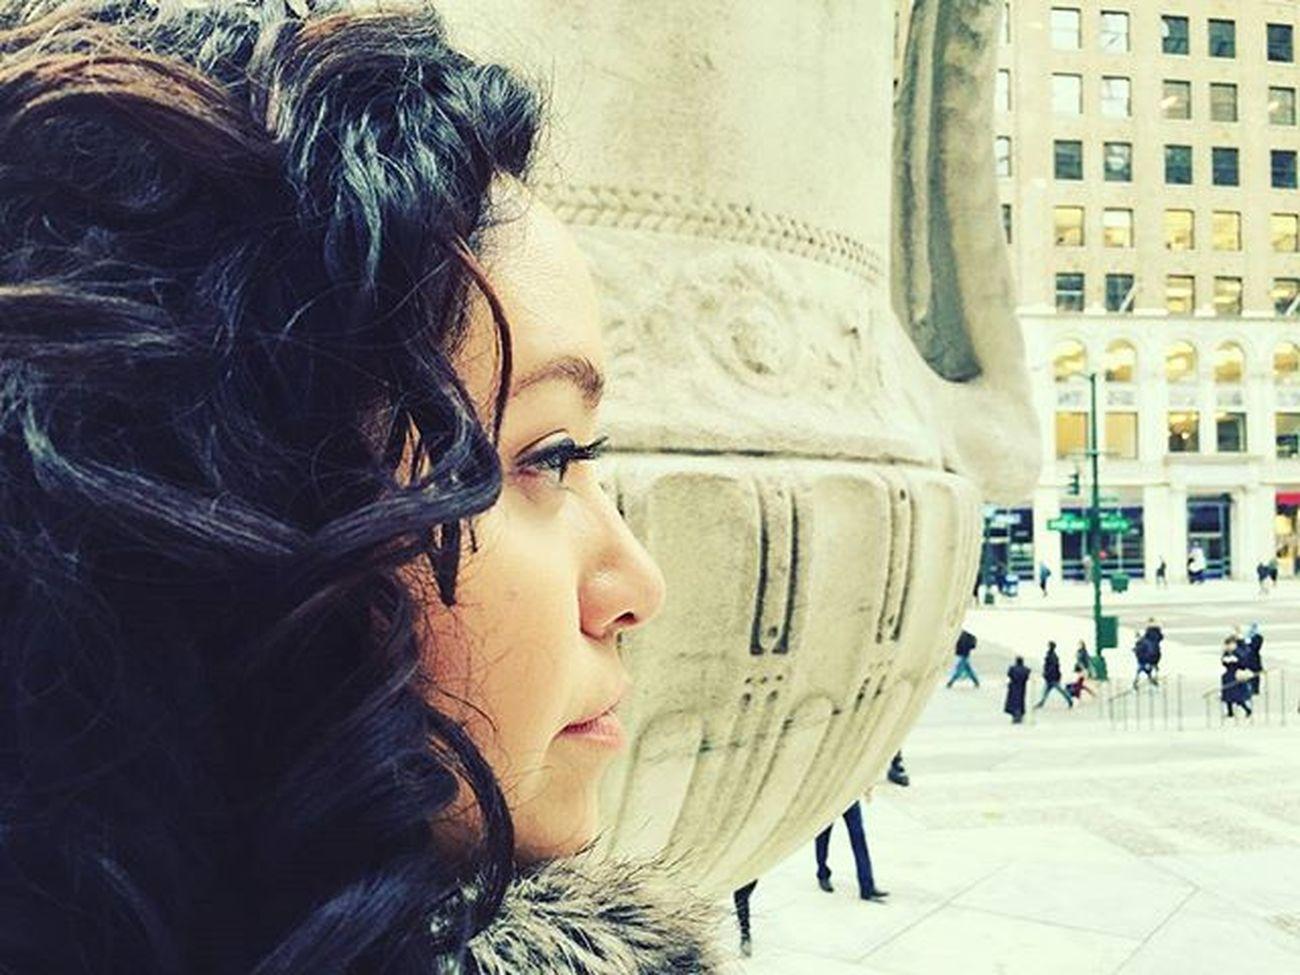 Eyes on the prize. Ignyc Igny Newyorkcity NYC Newyork Streetphotography Peoplescreative Gameoftones Illgrammers Shoot2kill Justgoshoot Instagood Cityliving Vscocam Vscogram Library Selfportrait